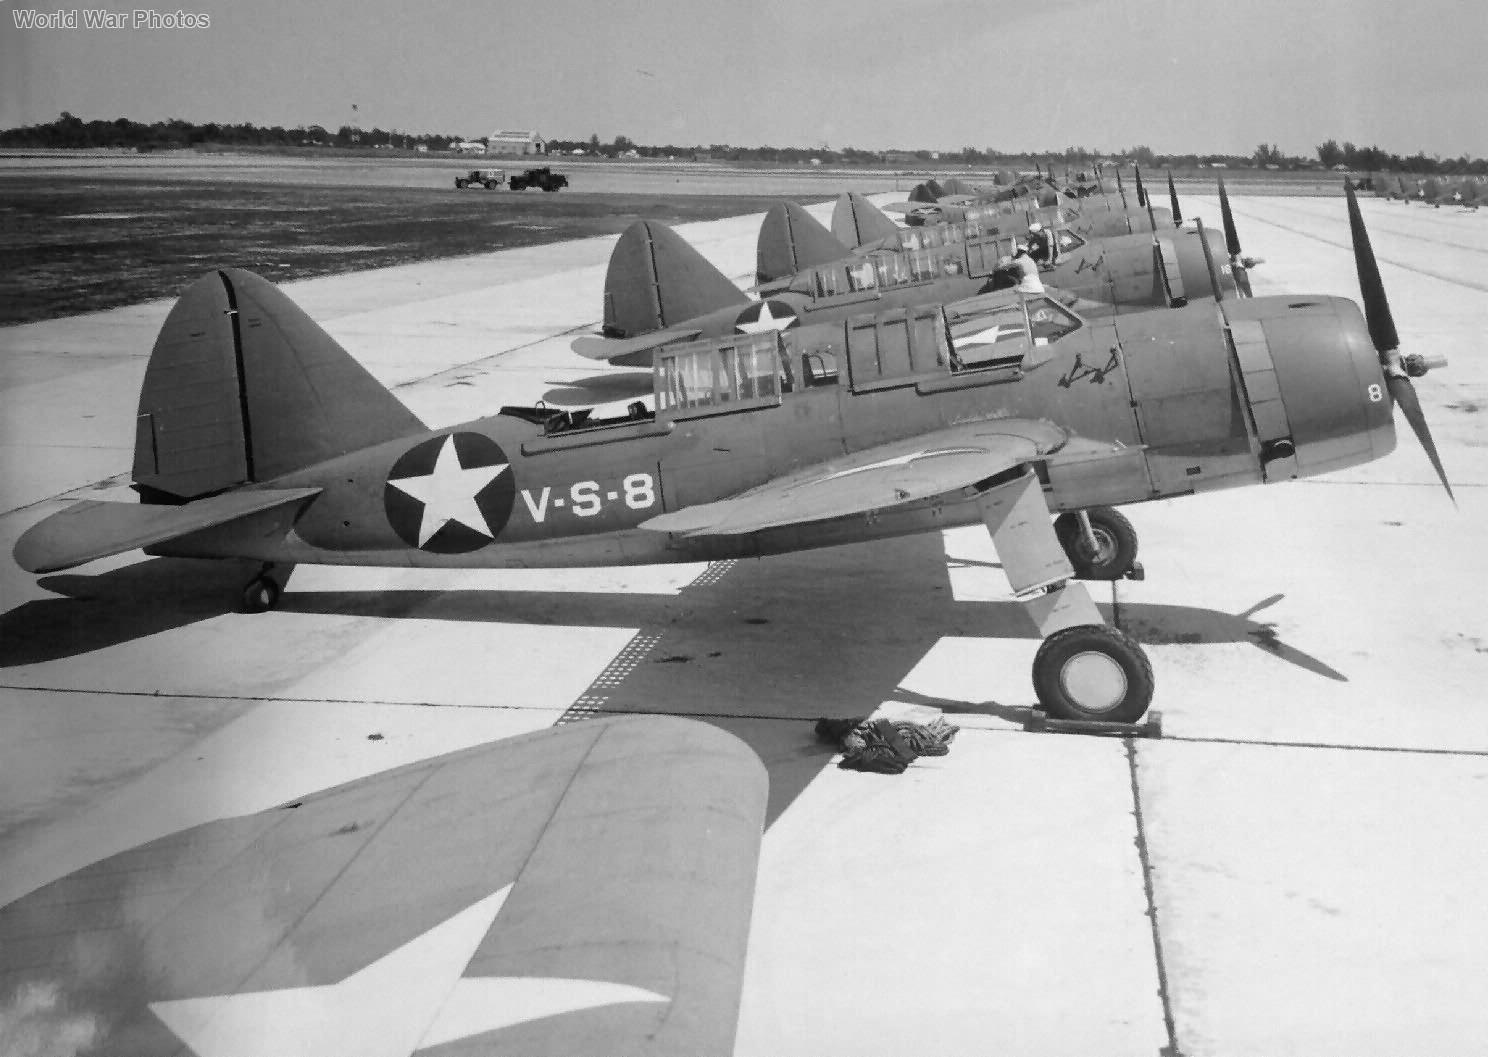 SB2A-4 Buccaner